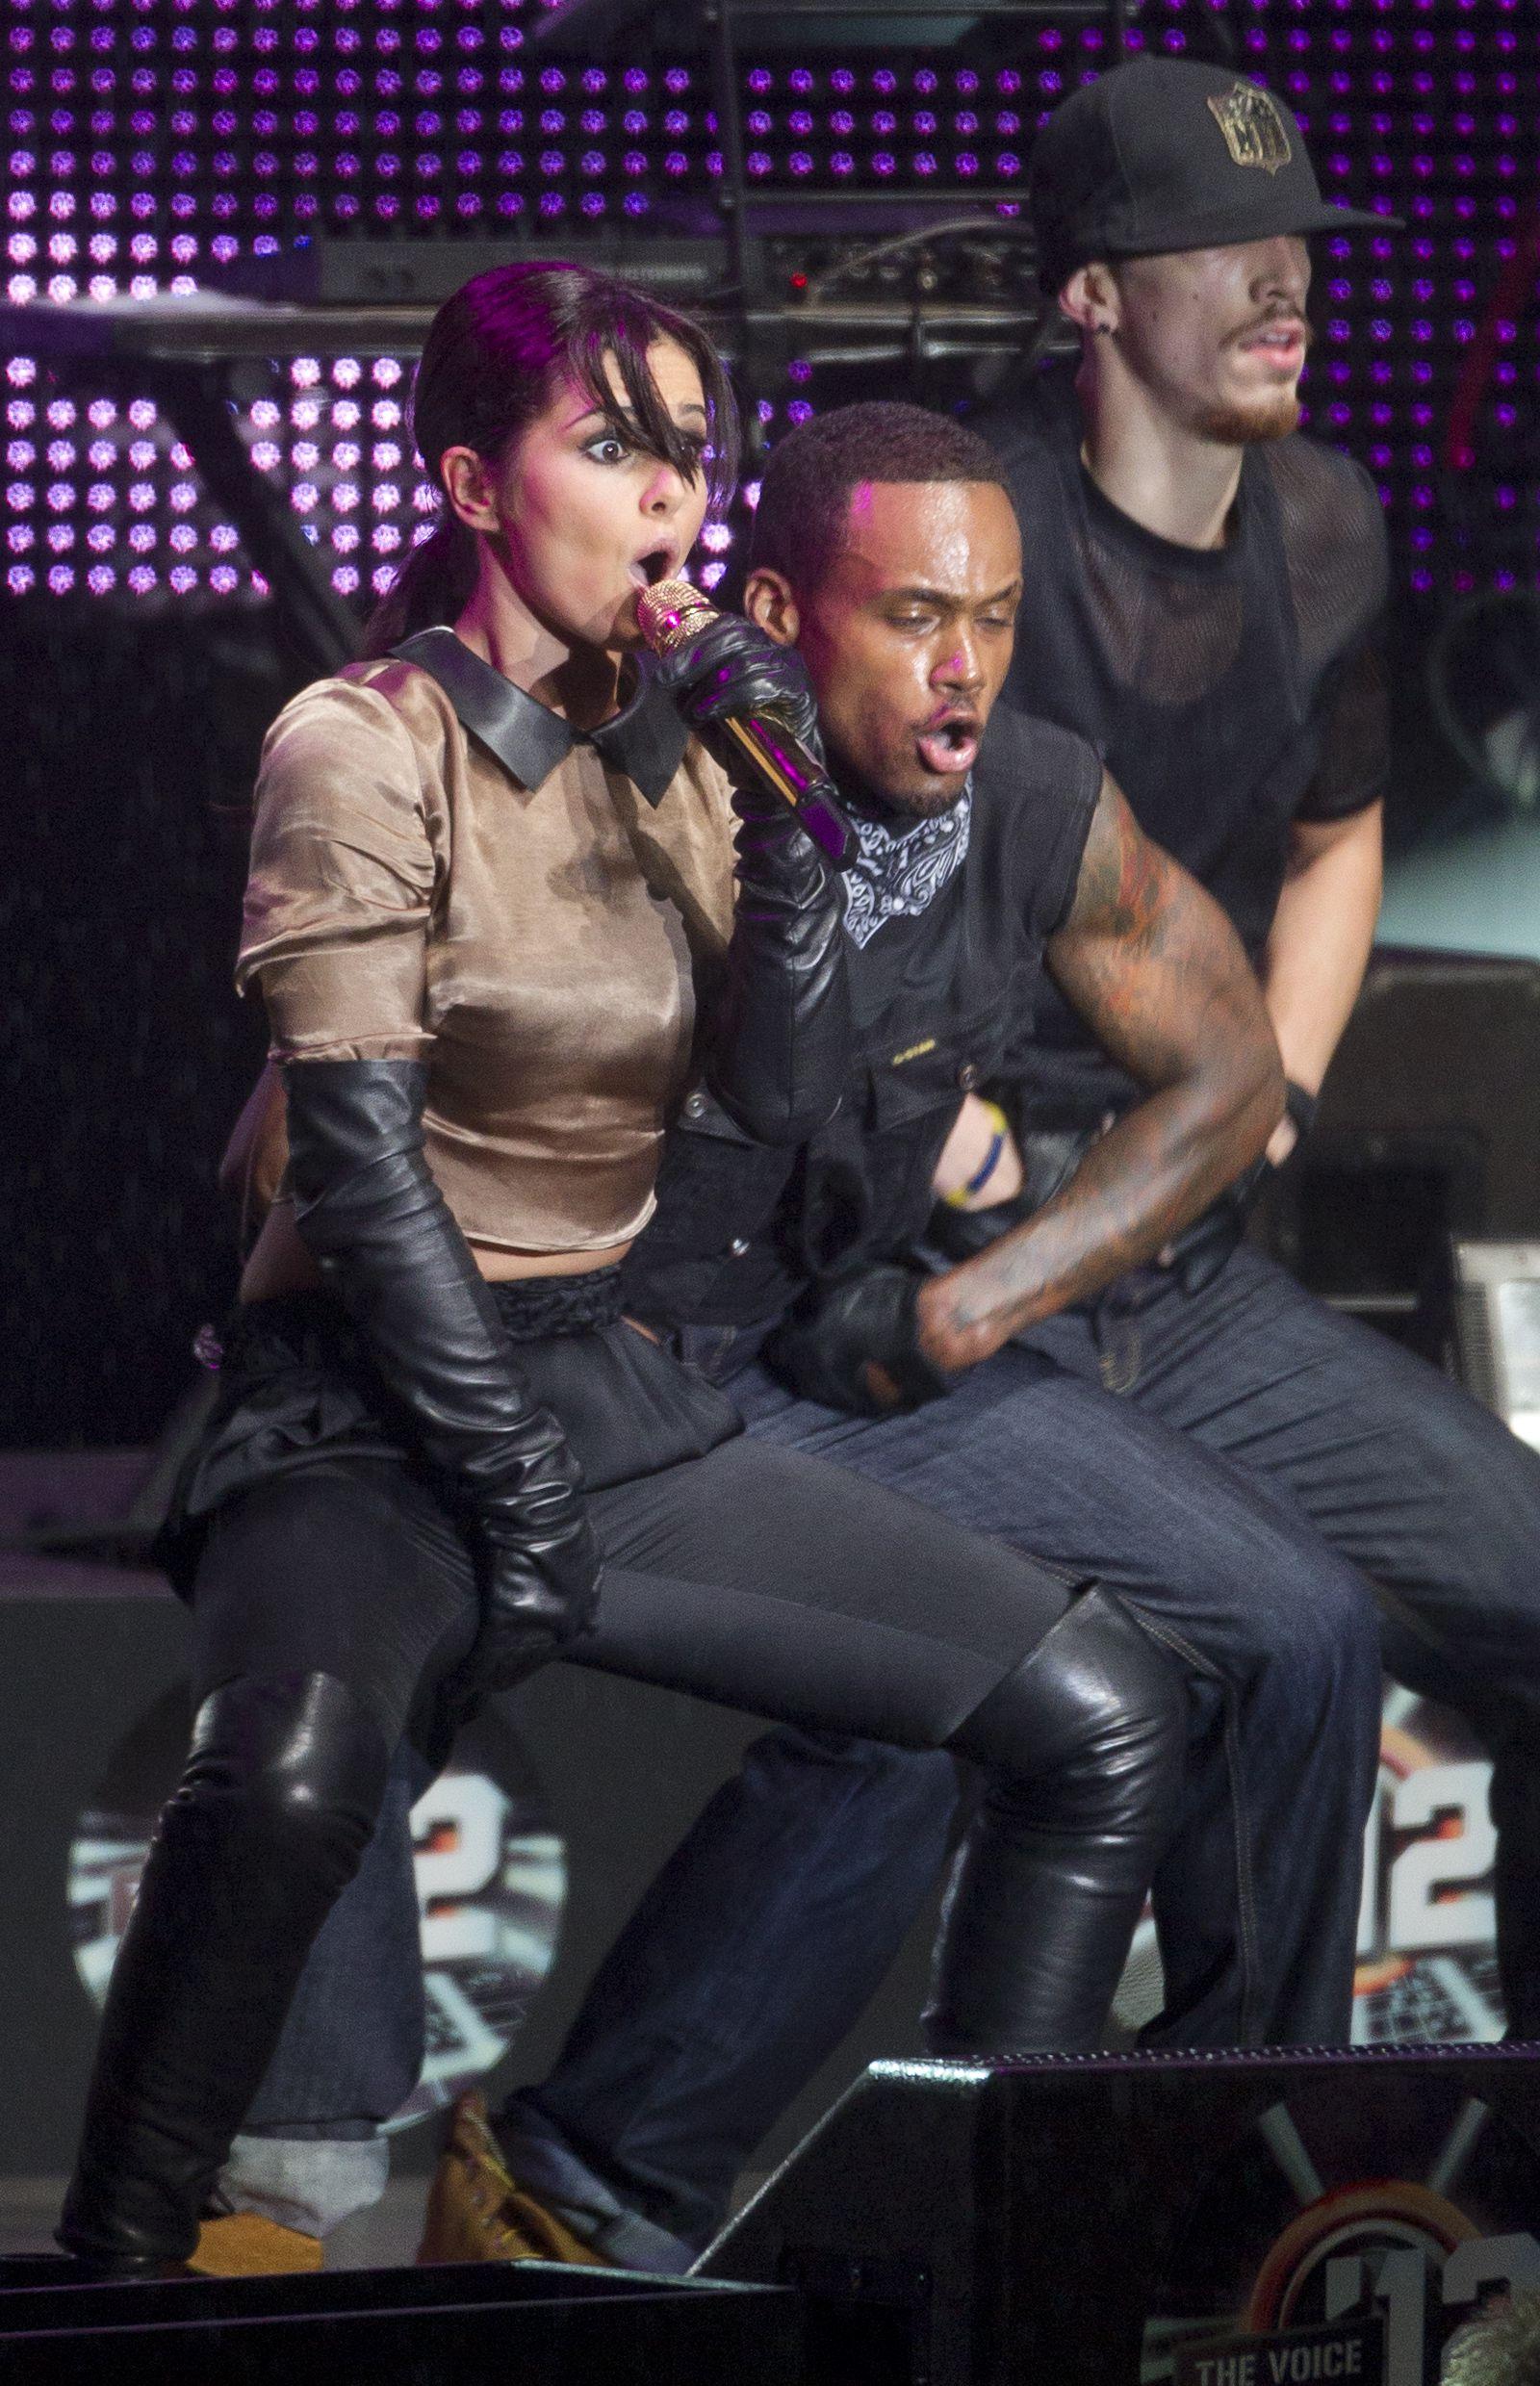 Cheryl Cole - The Voice_0002.jpg